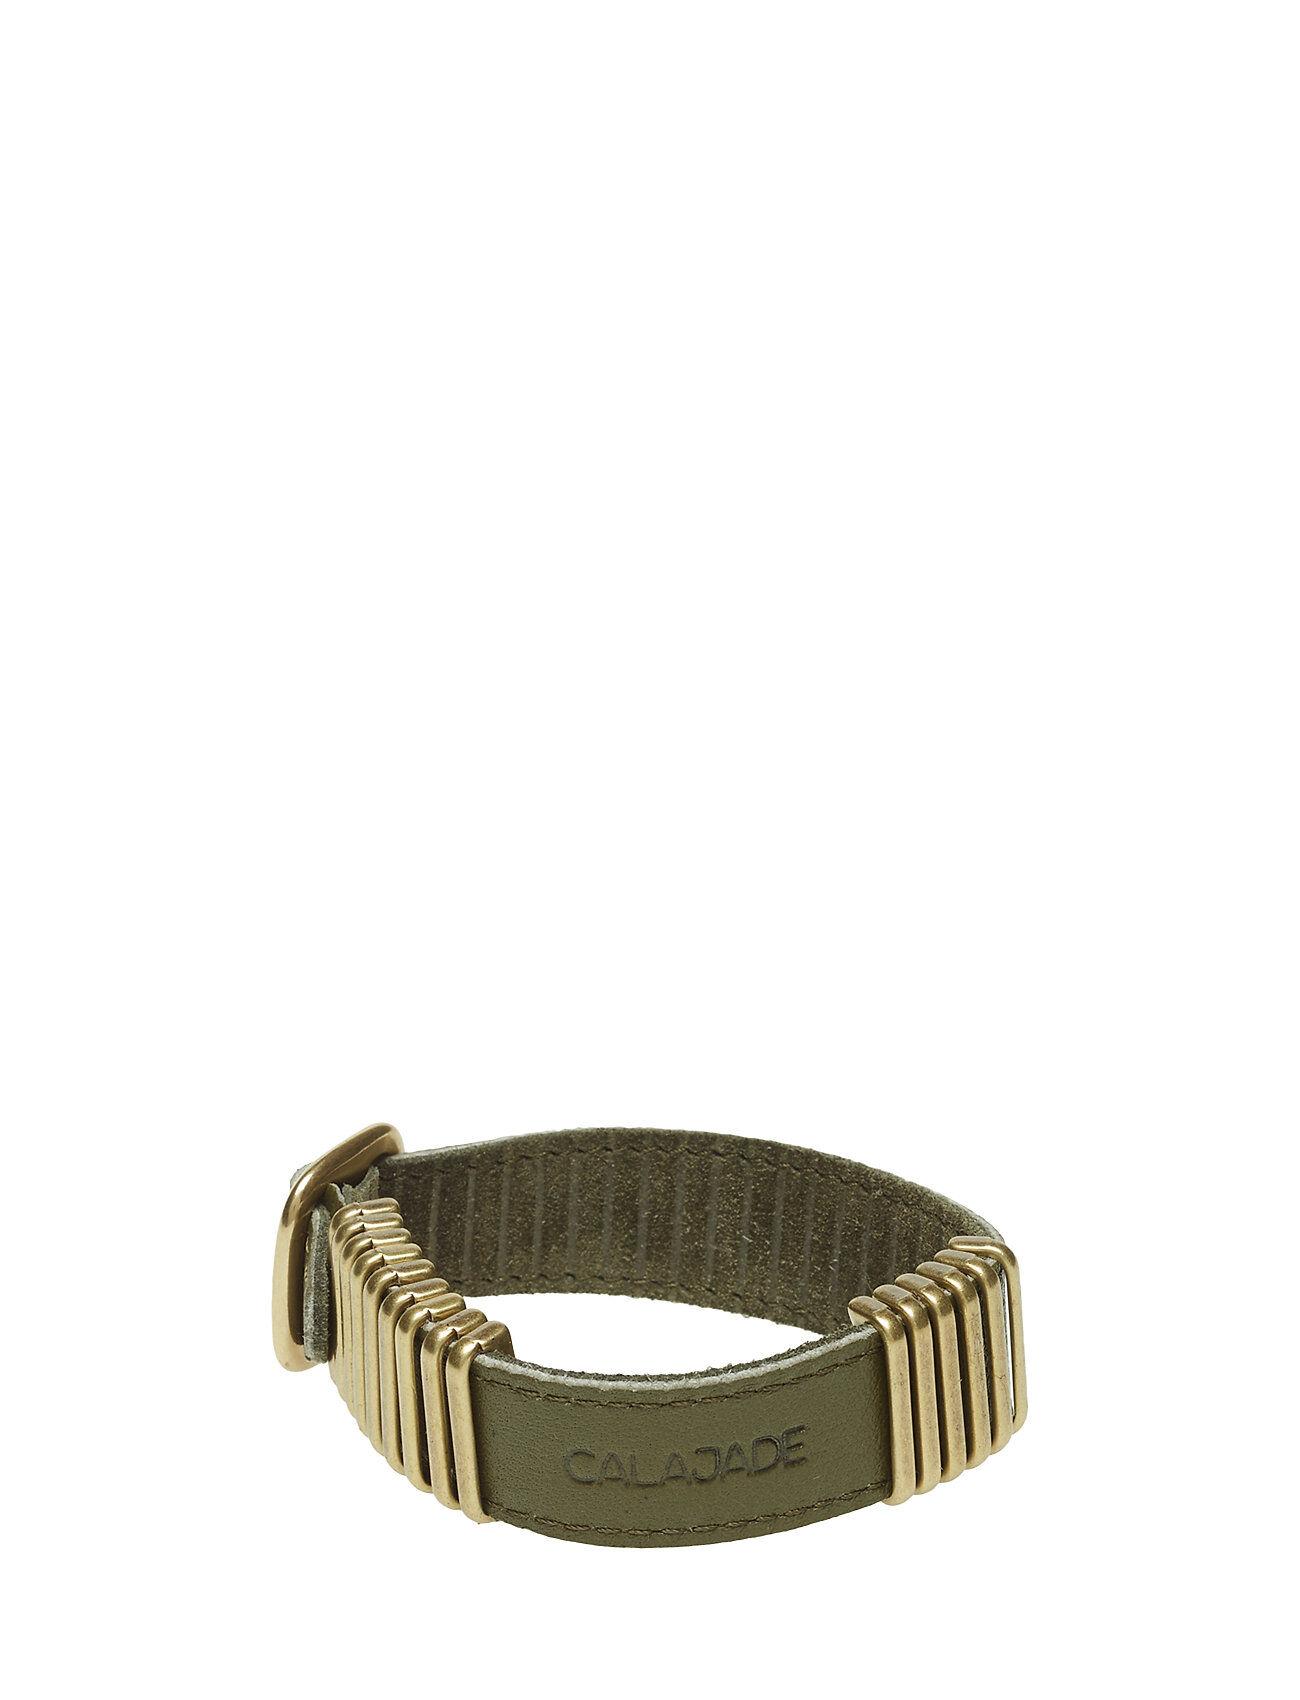 Cala Jade Rattle Bracelet